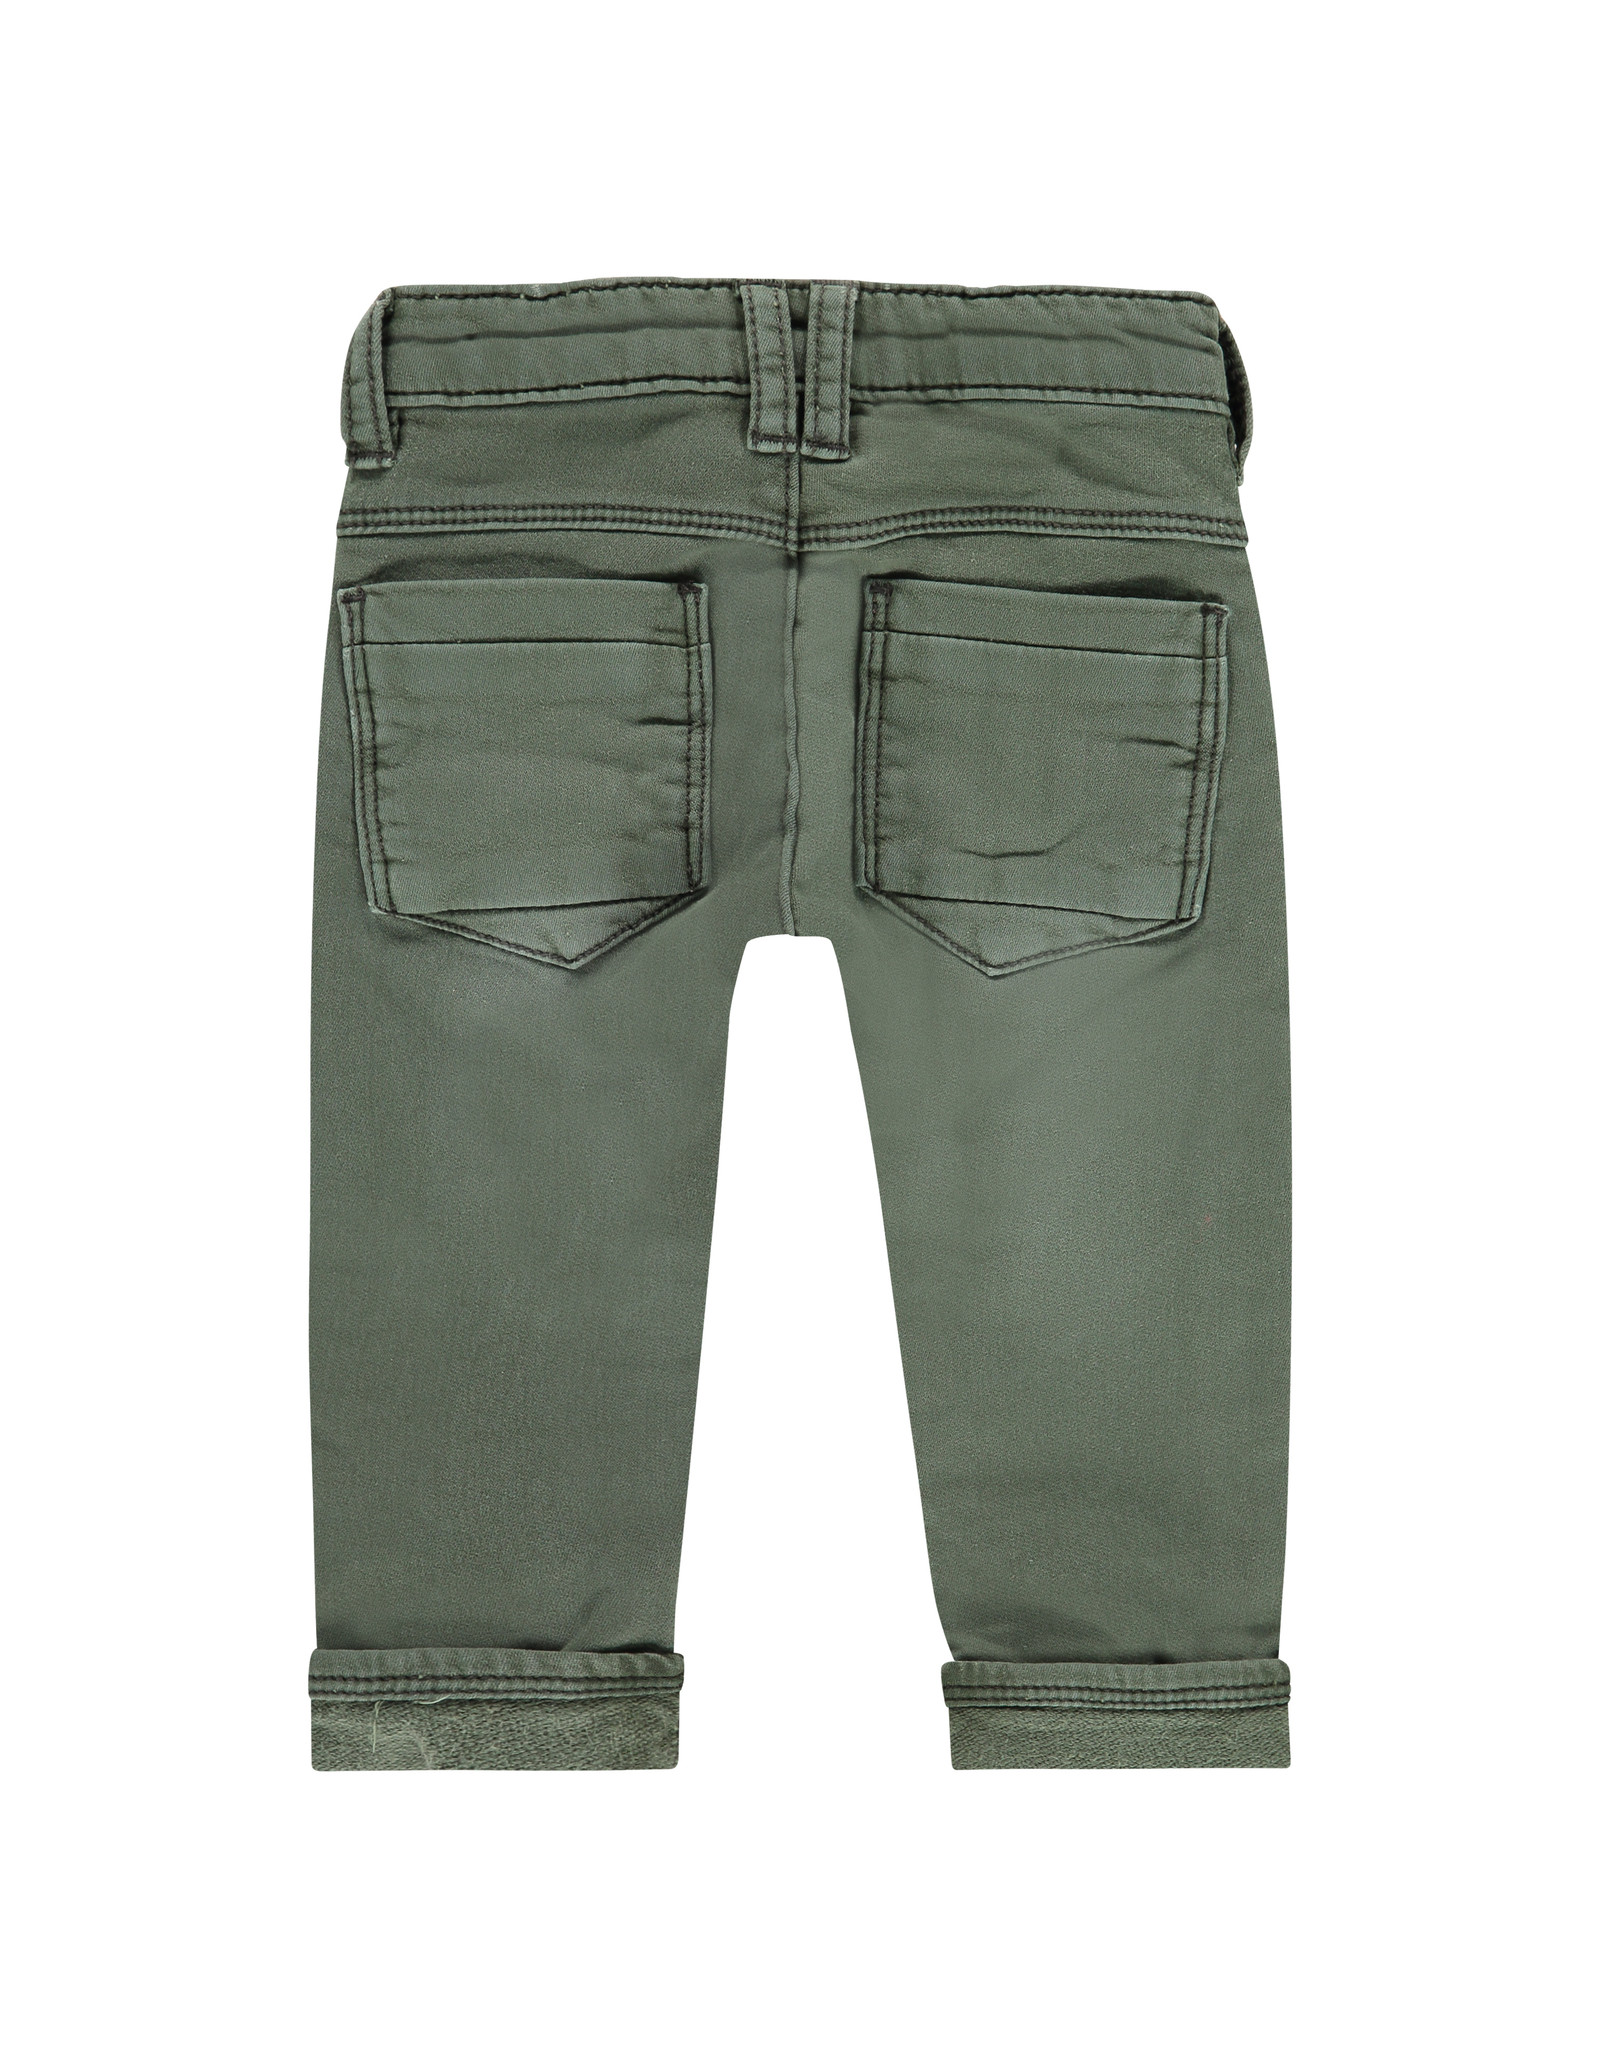 Babyface boys pants, army, BBE21107205